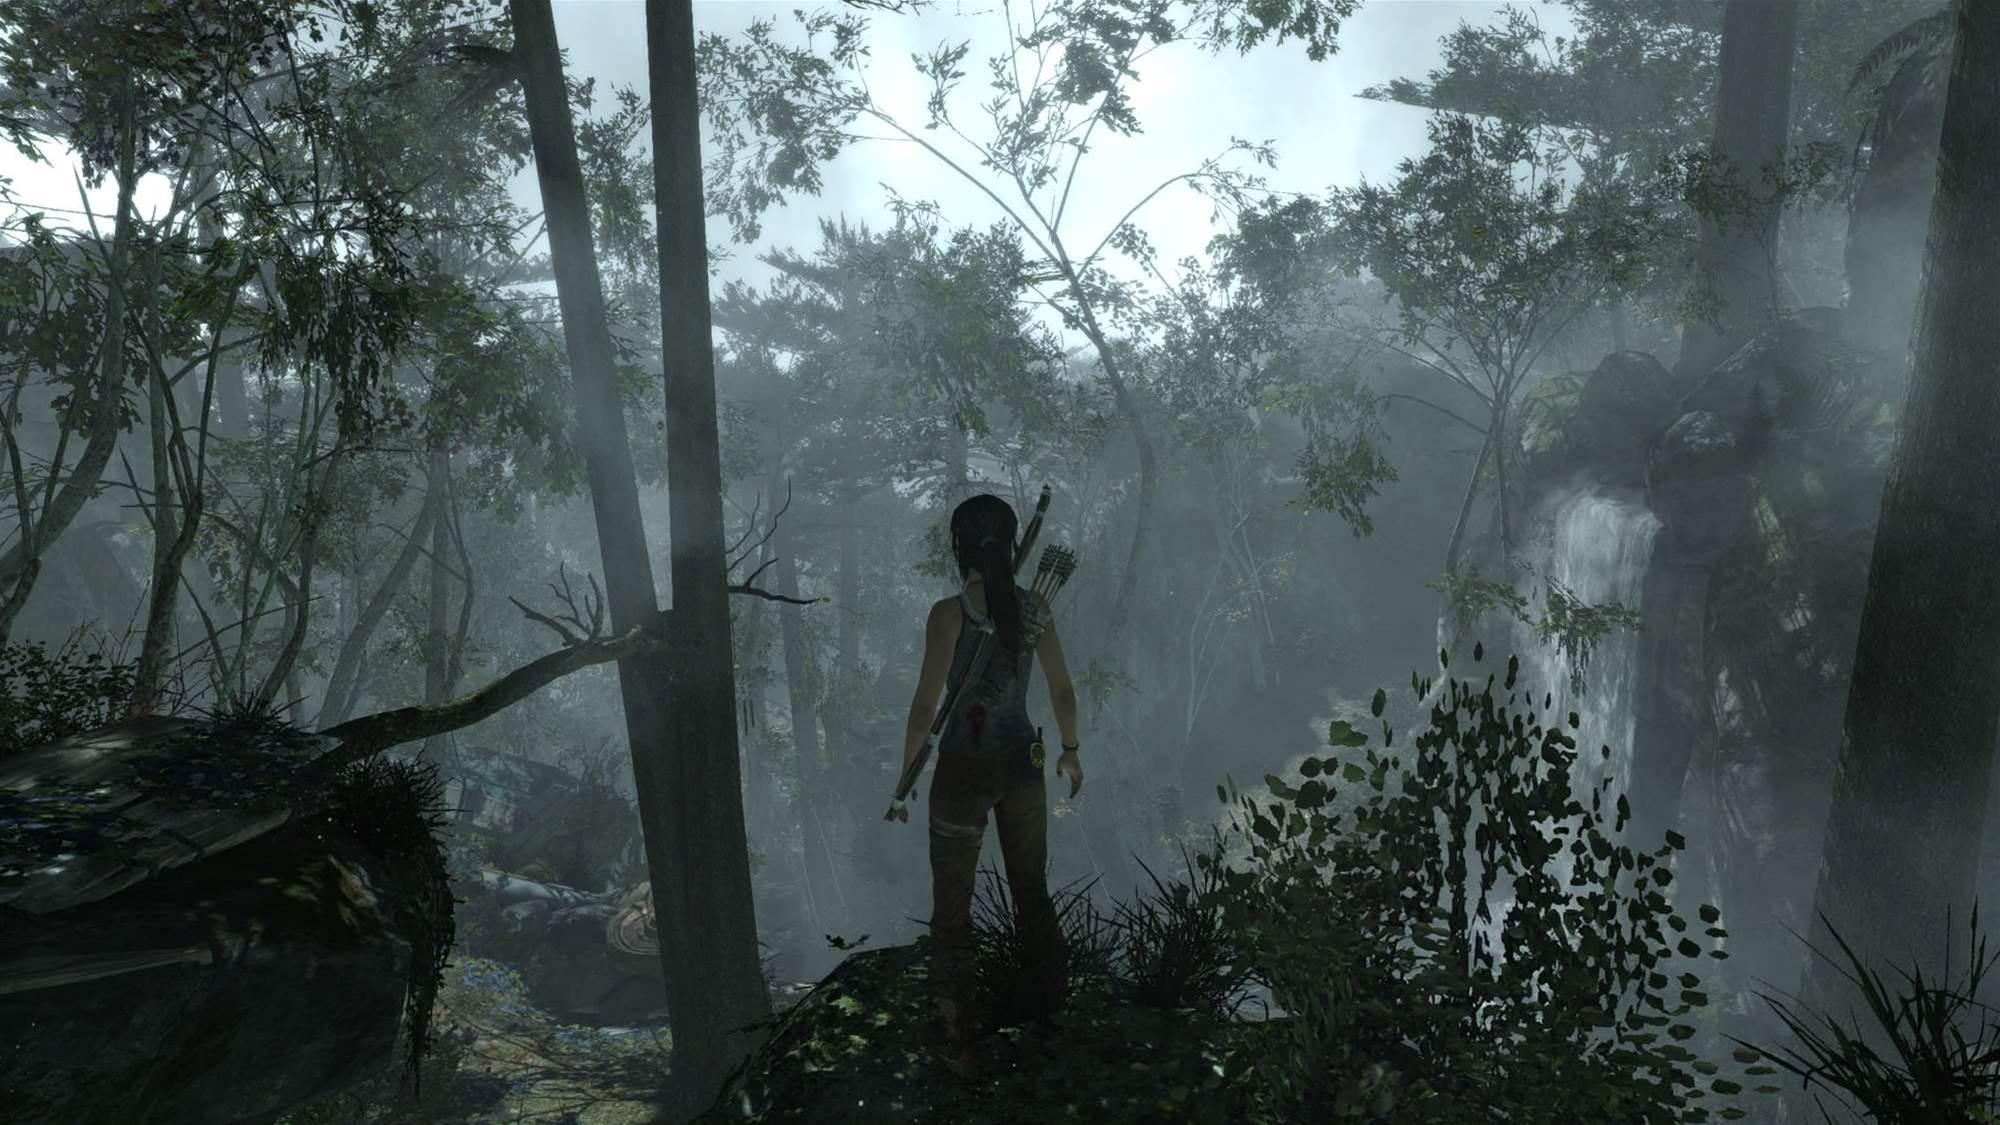 Tomb Raider versus Oni (no, not the Bungie game)